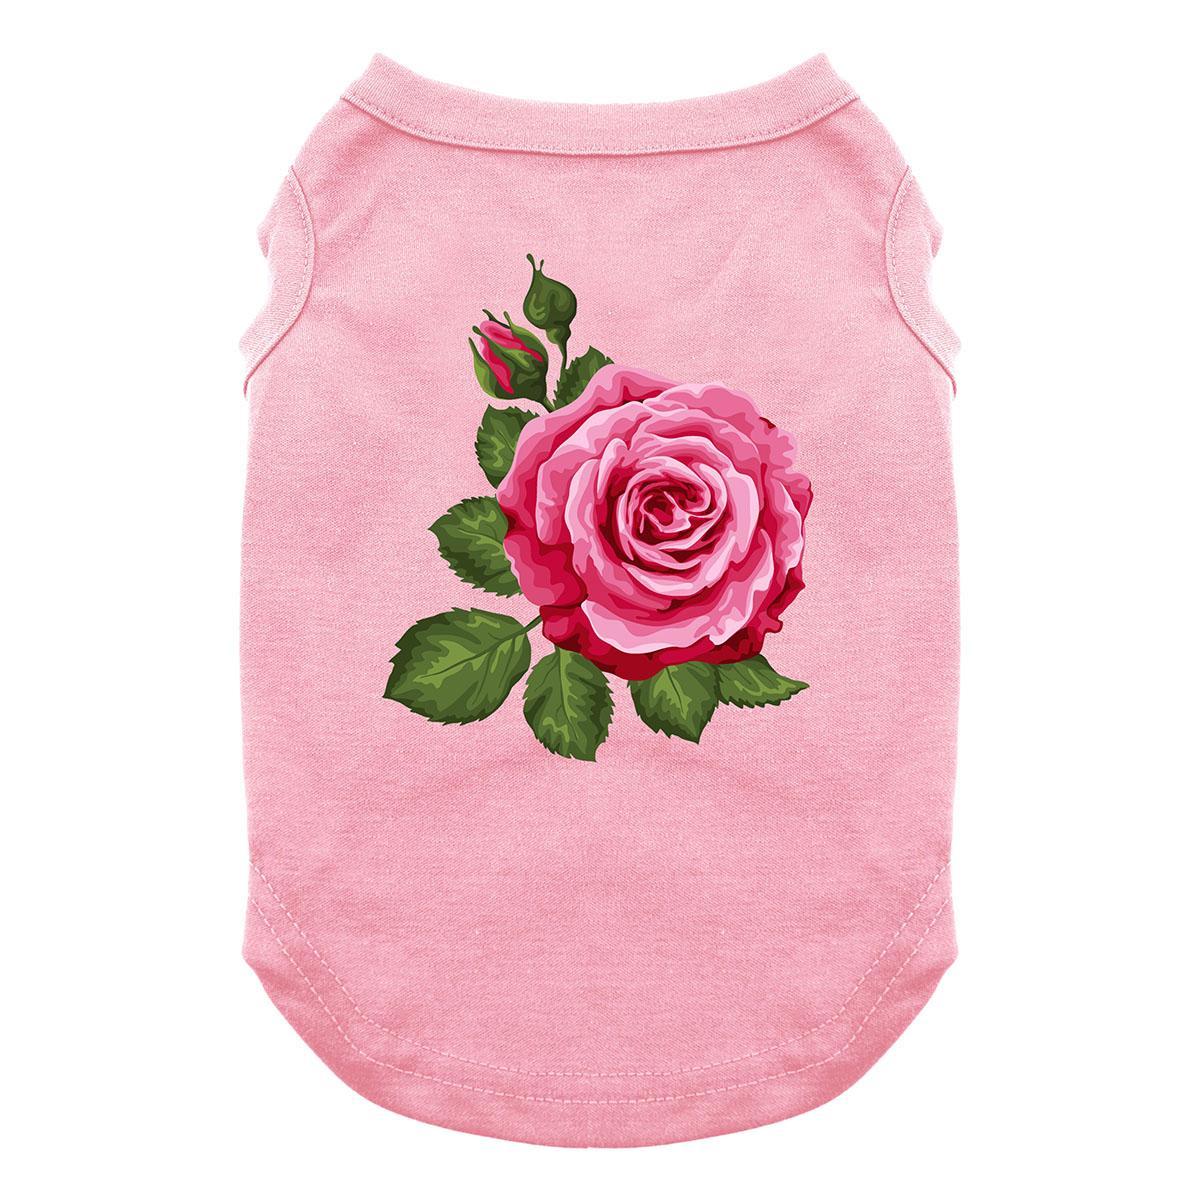 Rose in Full Bloom Dog Shirt - Light Pink